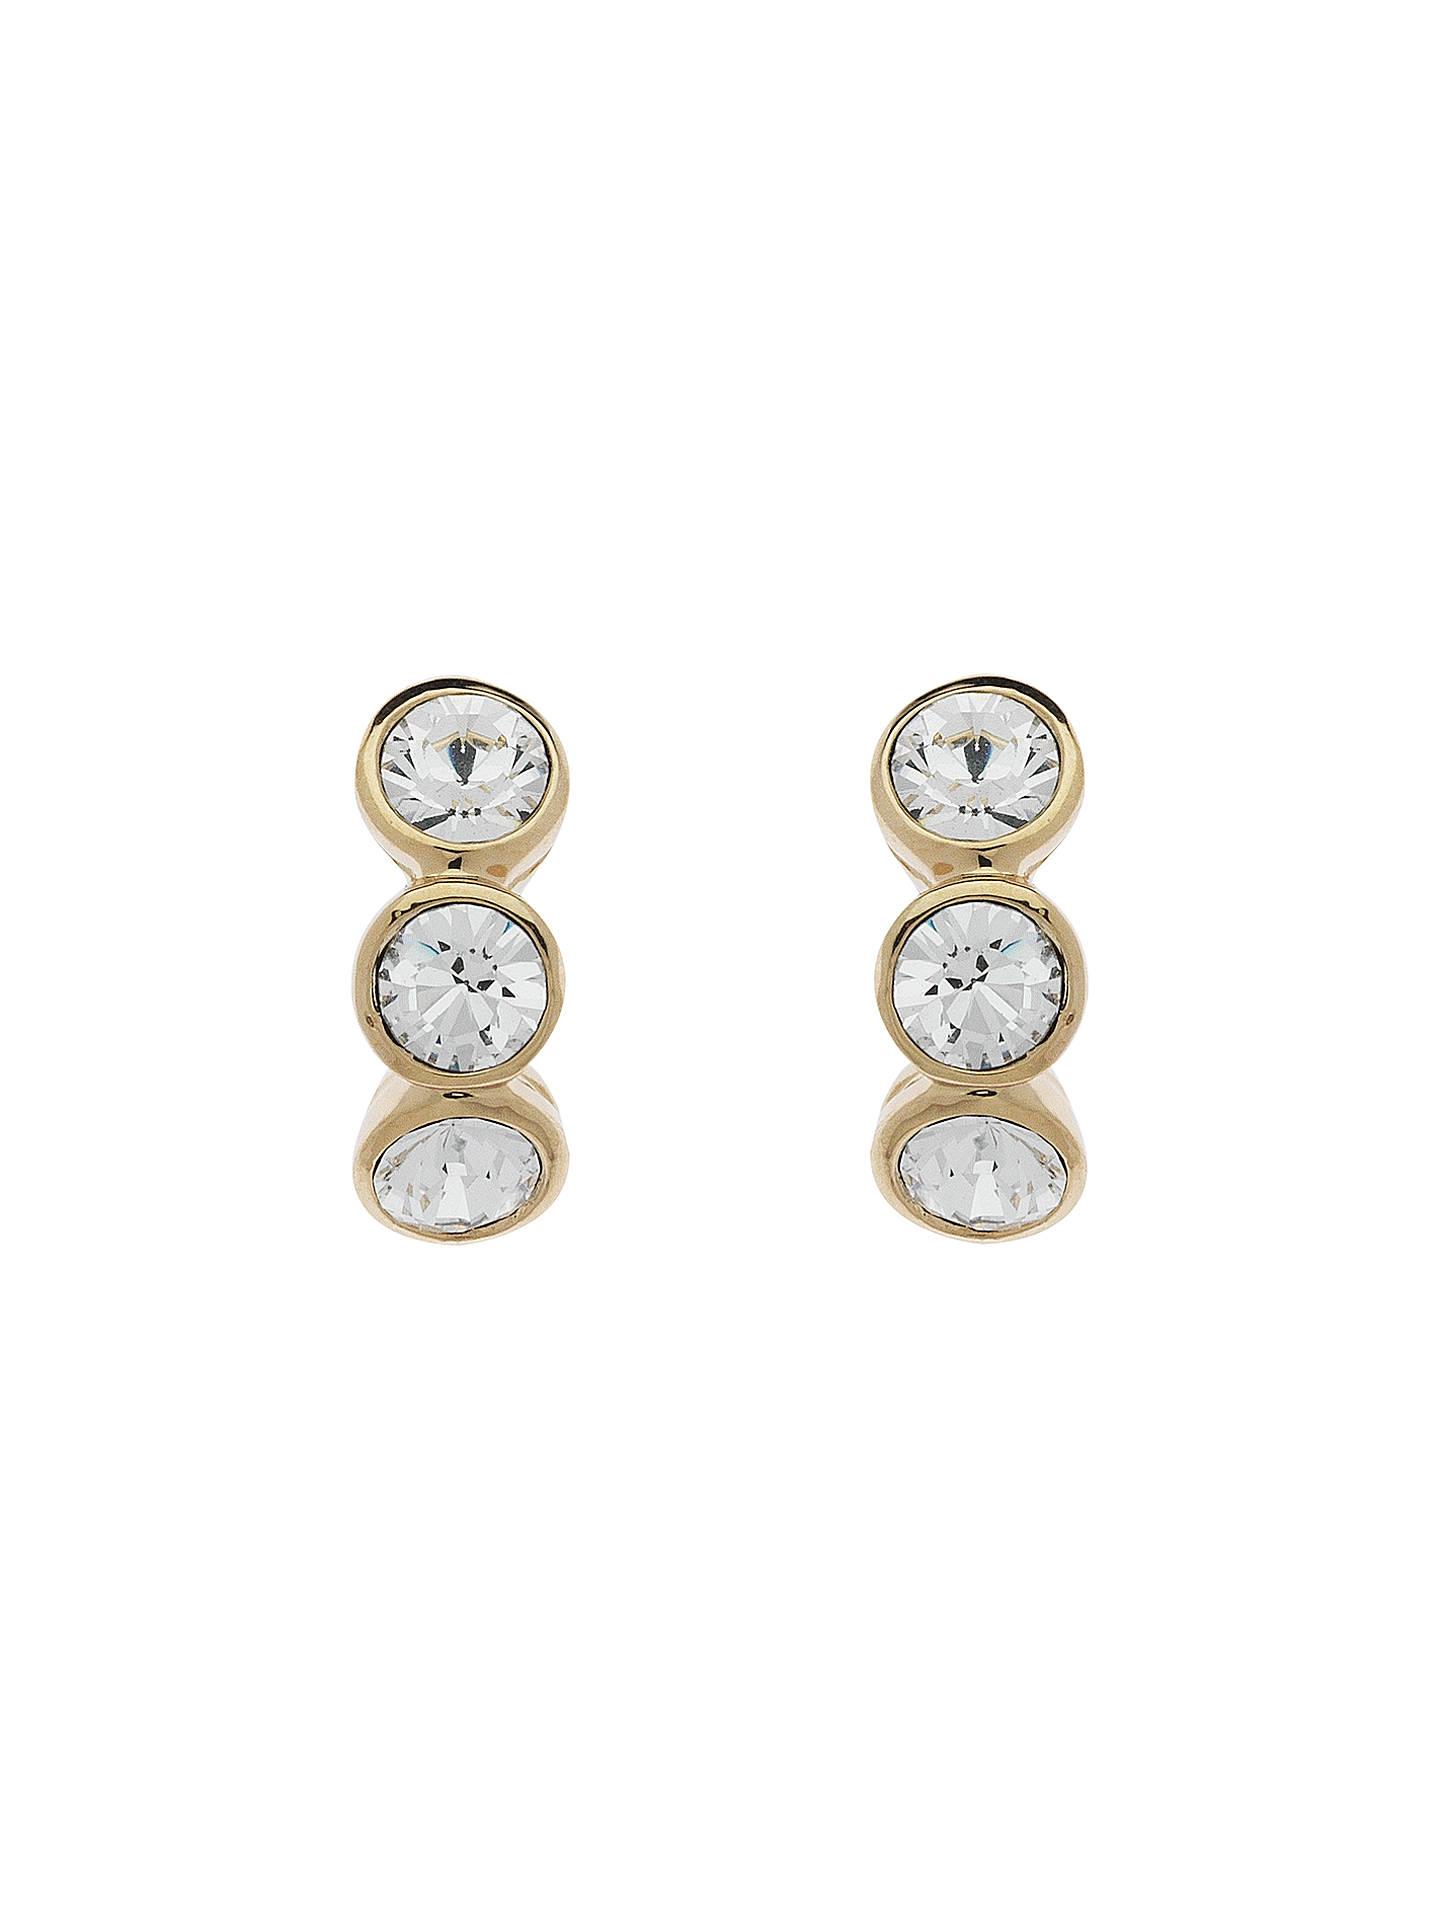 14eadd2d2d Cachet Swarovski Crystal 3 Stone Mini Stud Earrings, Gold